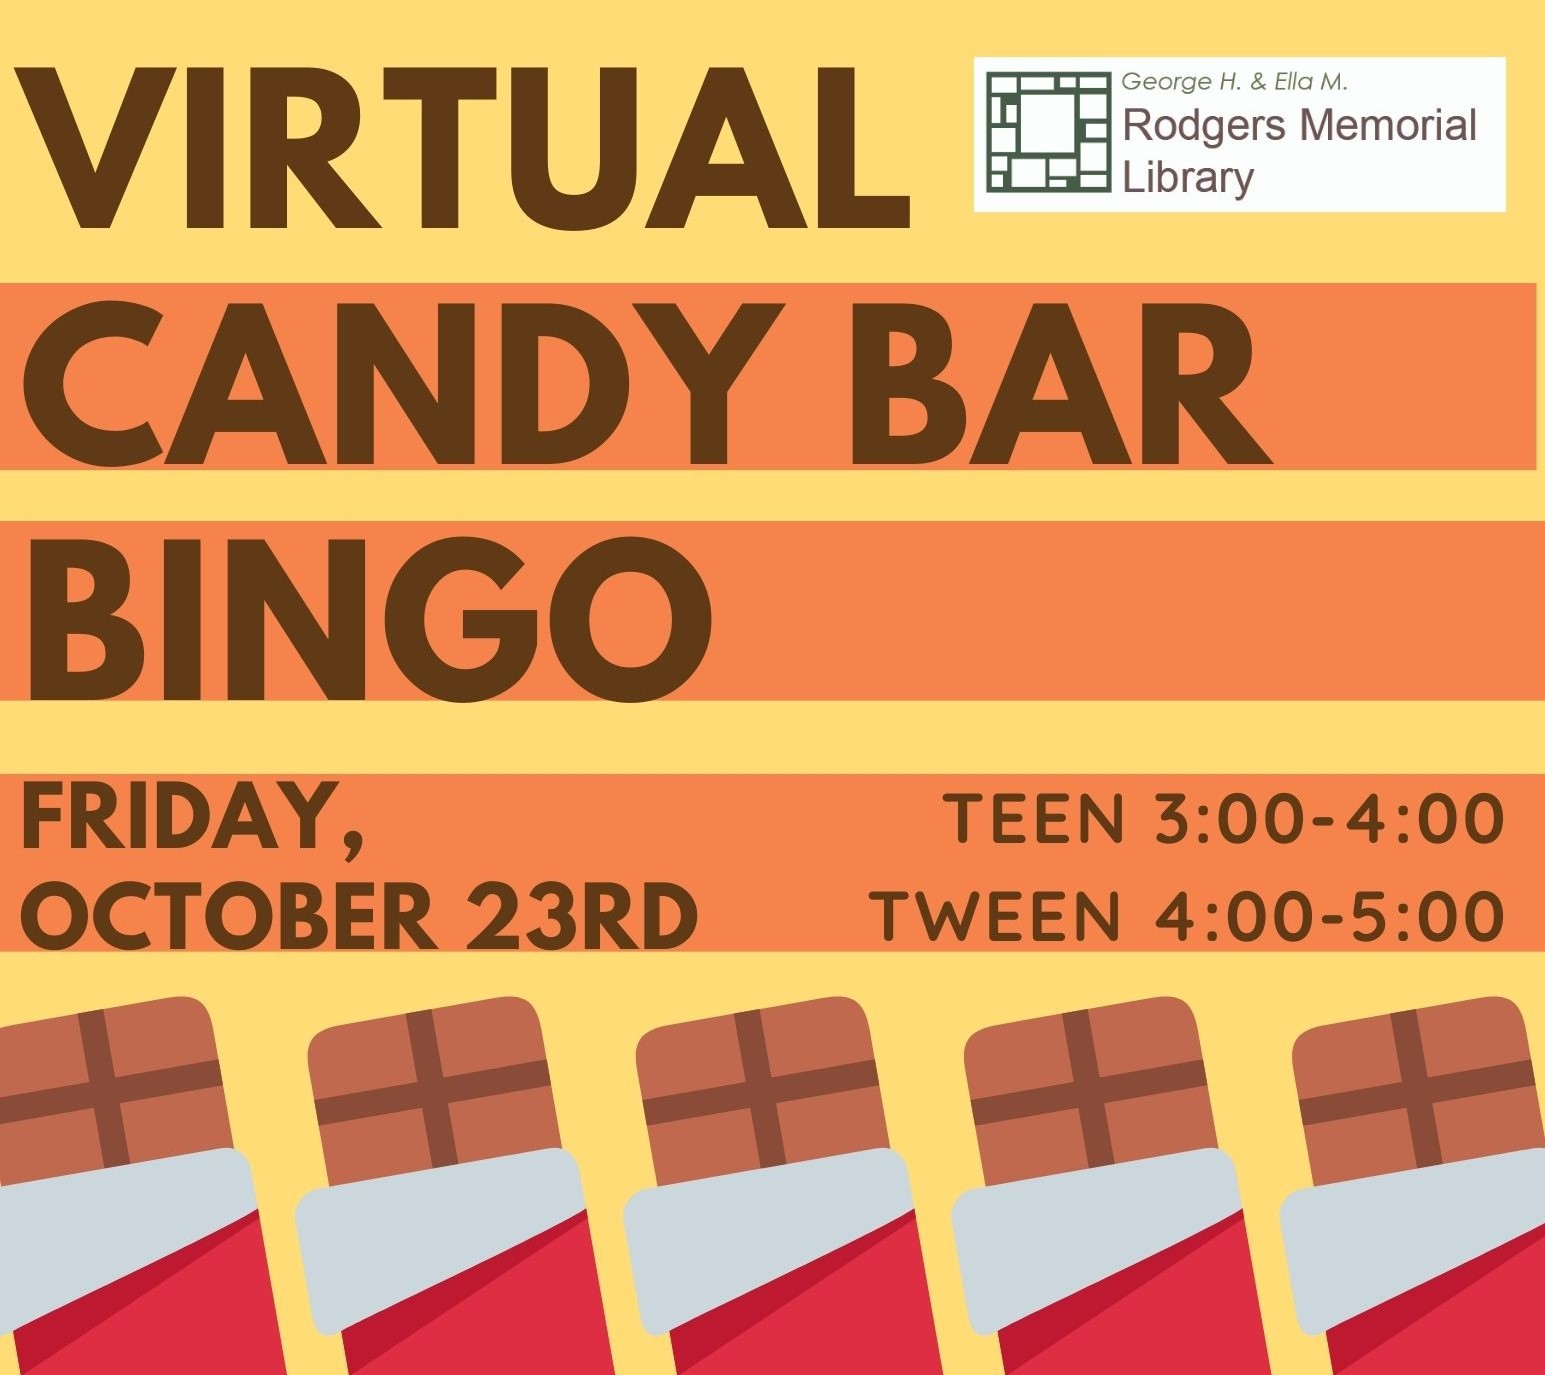 Virtual TEEN Candy Bar BINGO